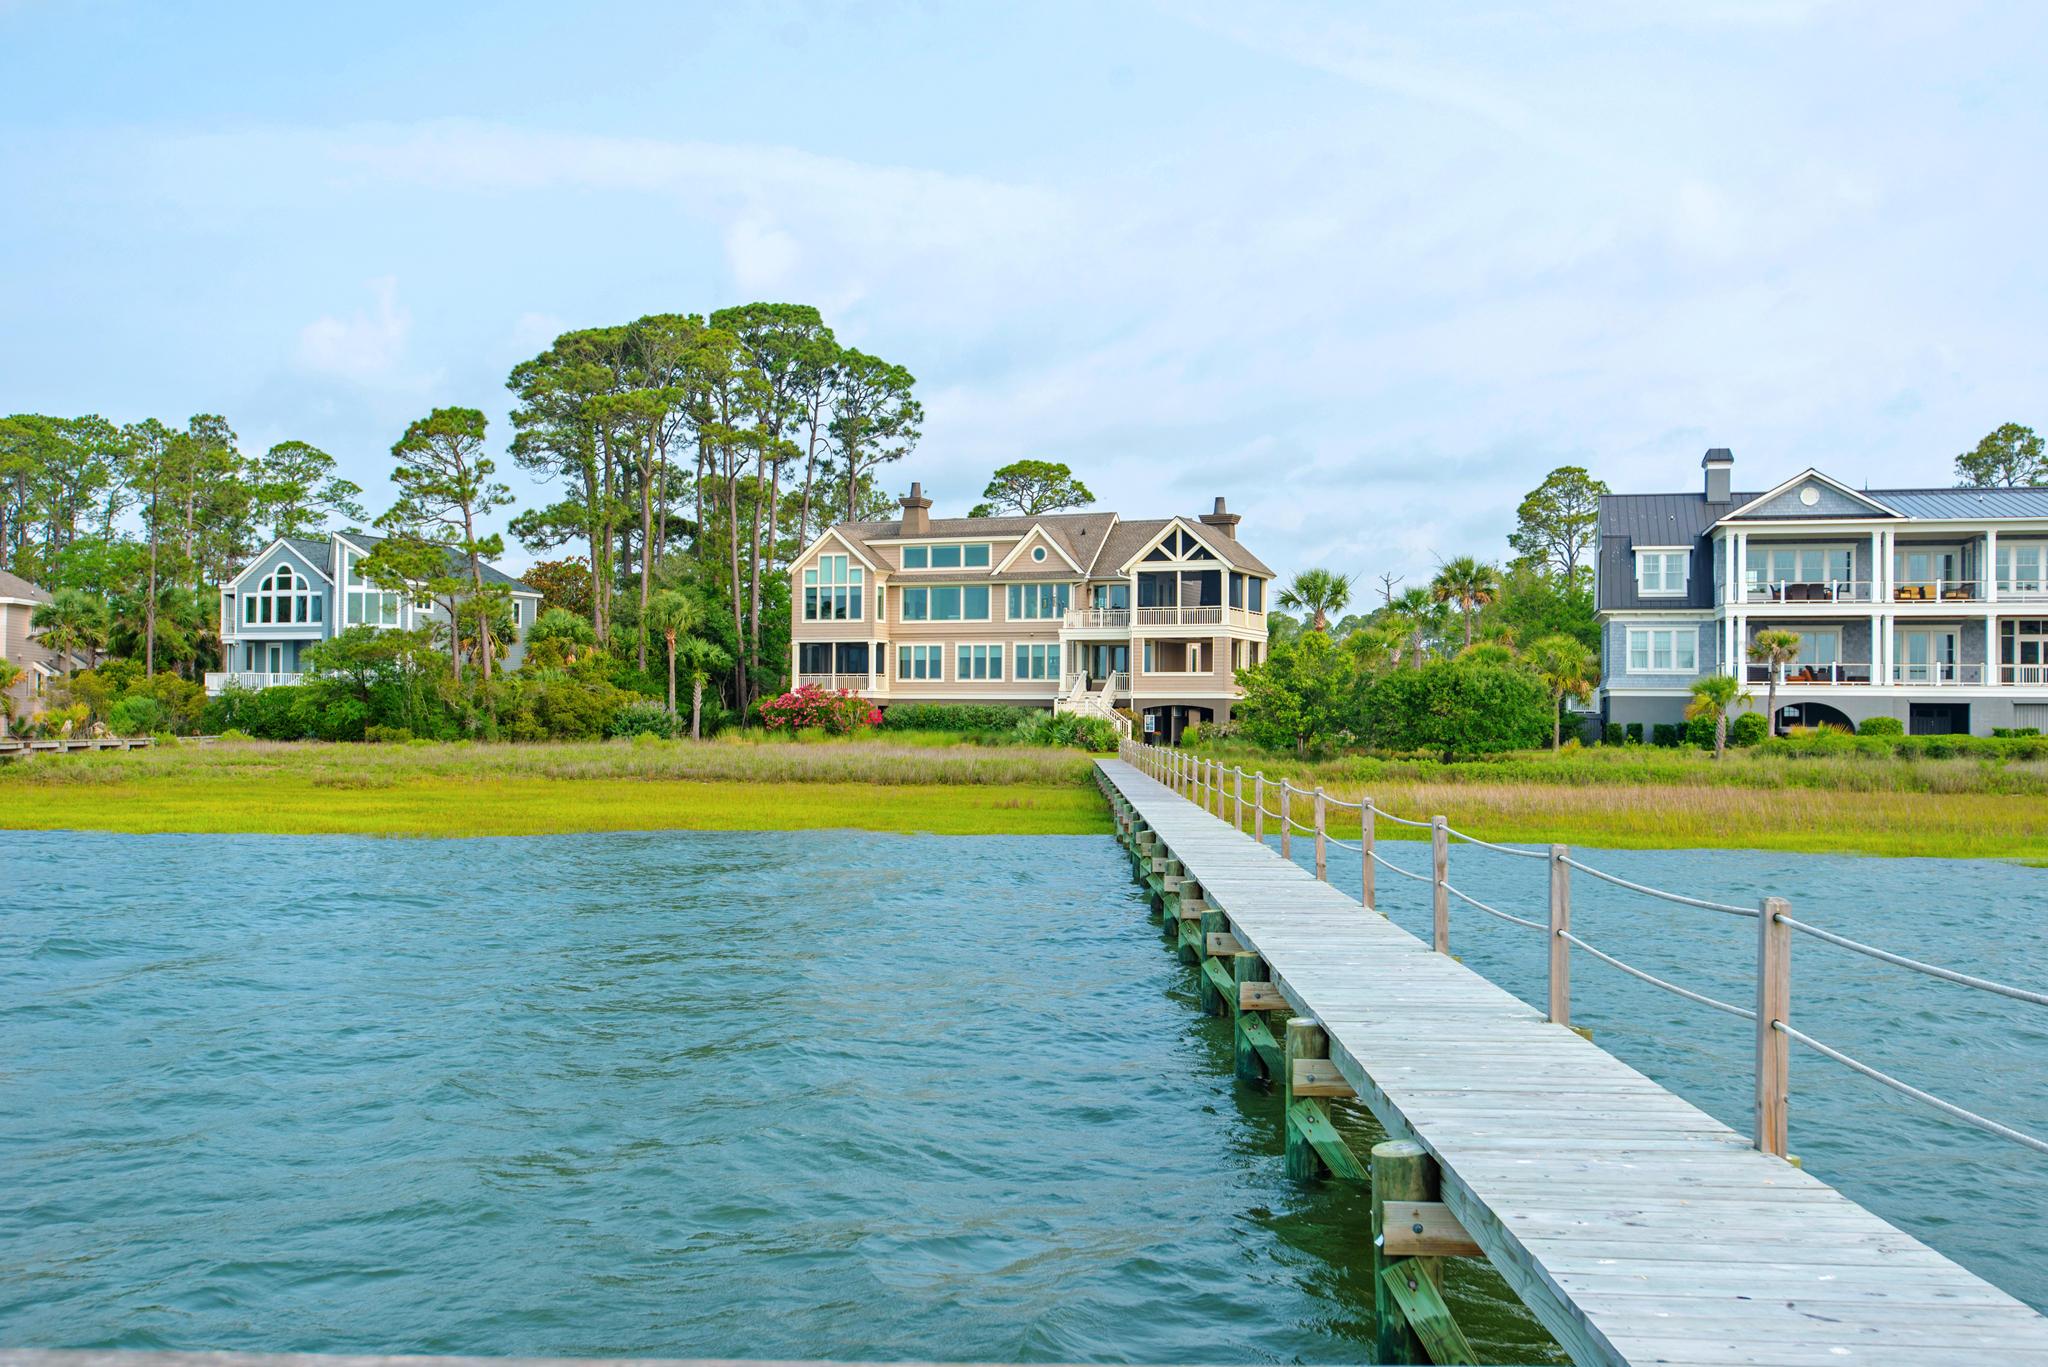 Seabrook Island Homes For Sale - 3135 Marshgate, Seabrook Island, SC - 8